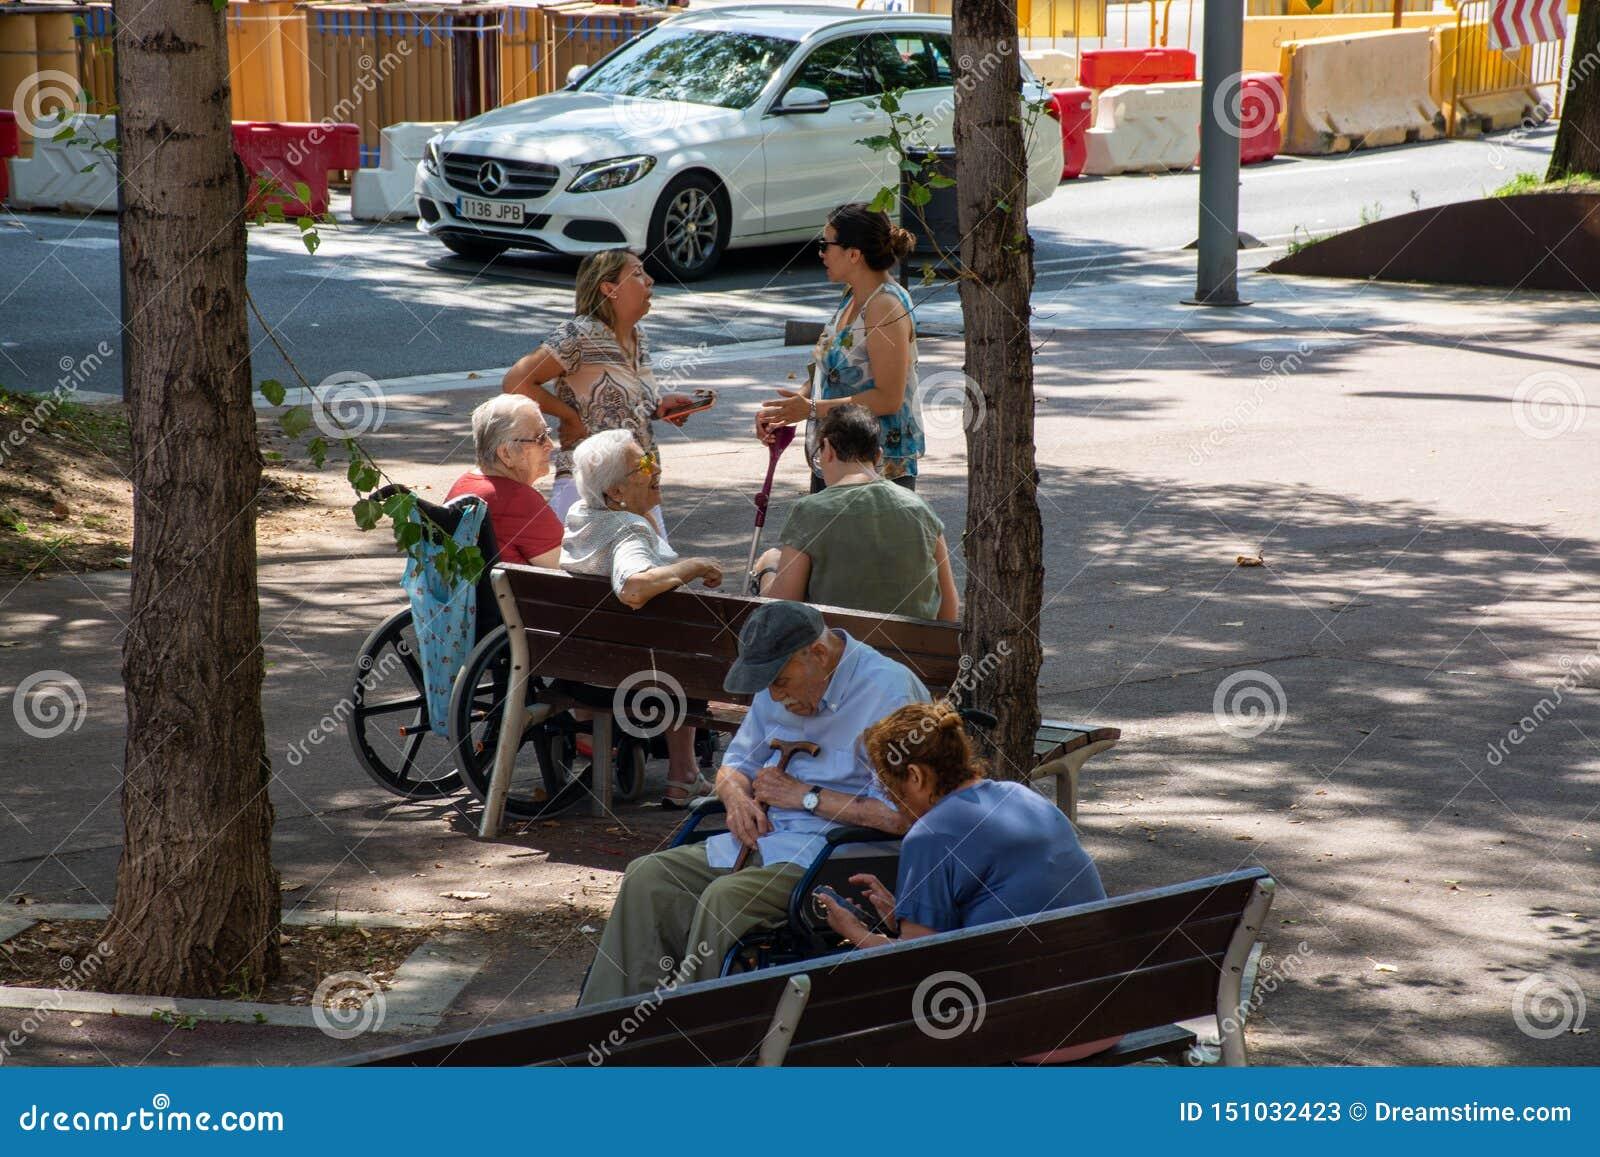 Elderly people sitting on bench sleeping talking